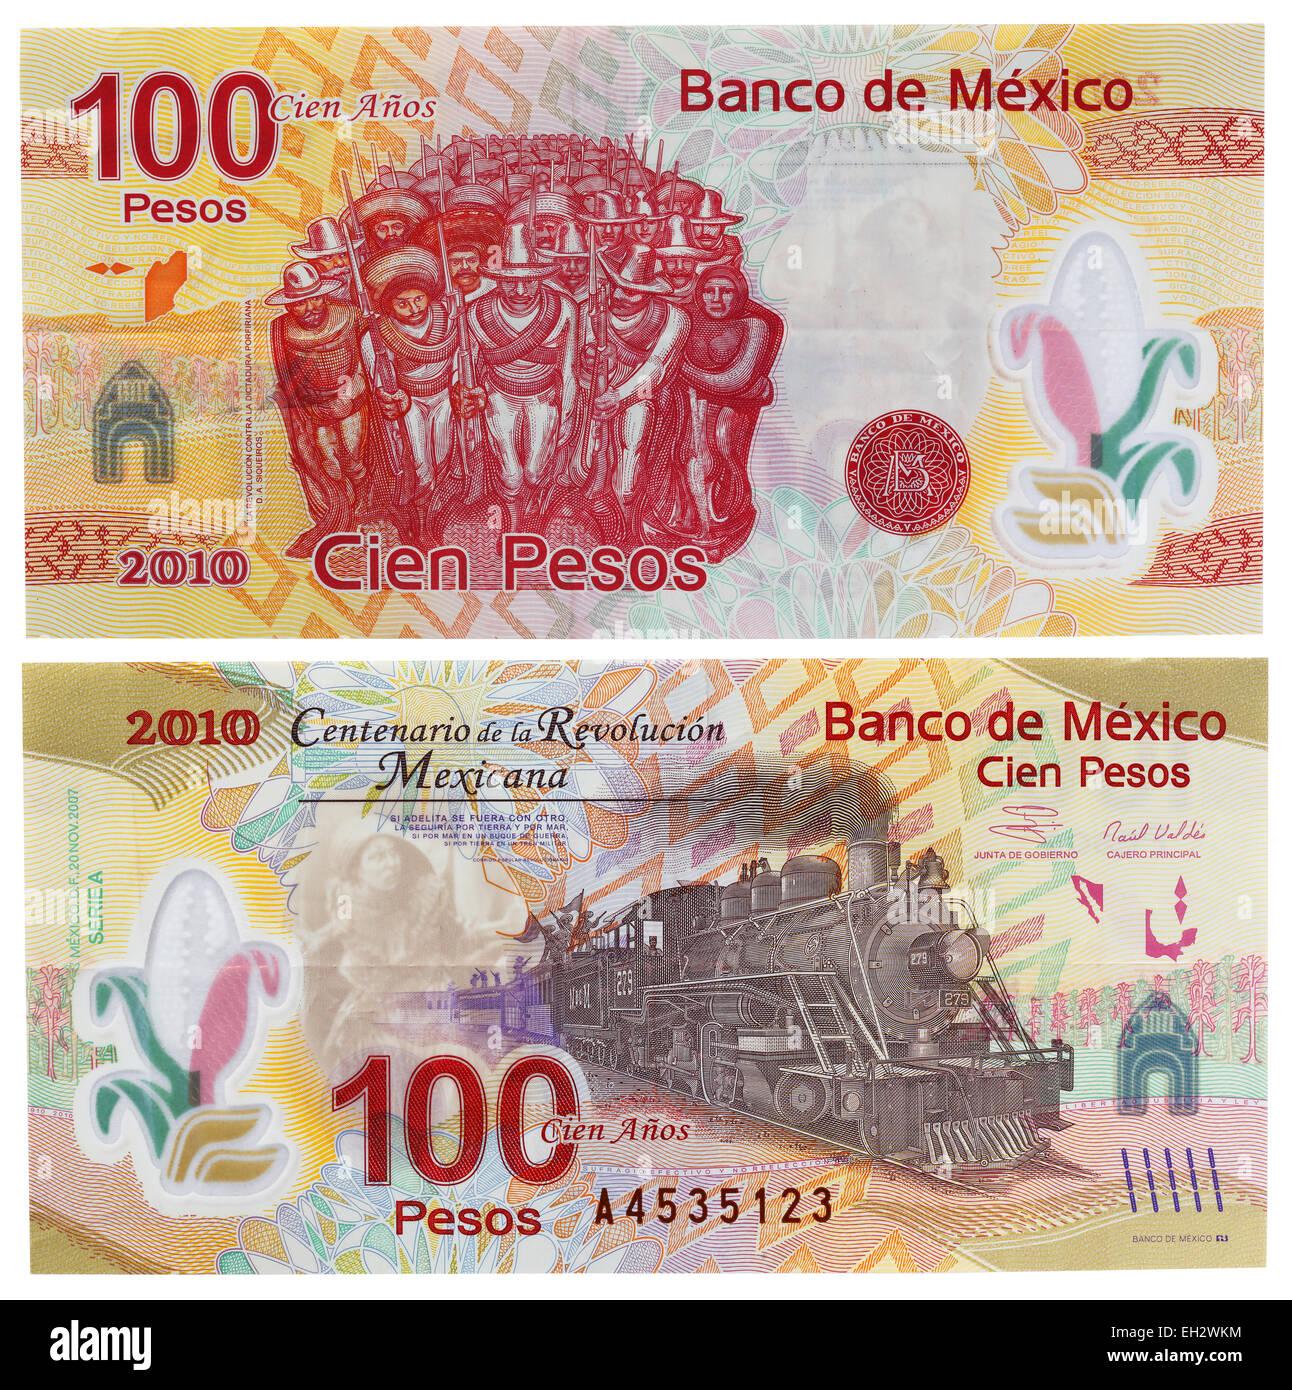 100 pesos banknote, Mexico, 2007 - Stock Image